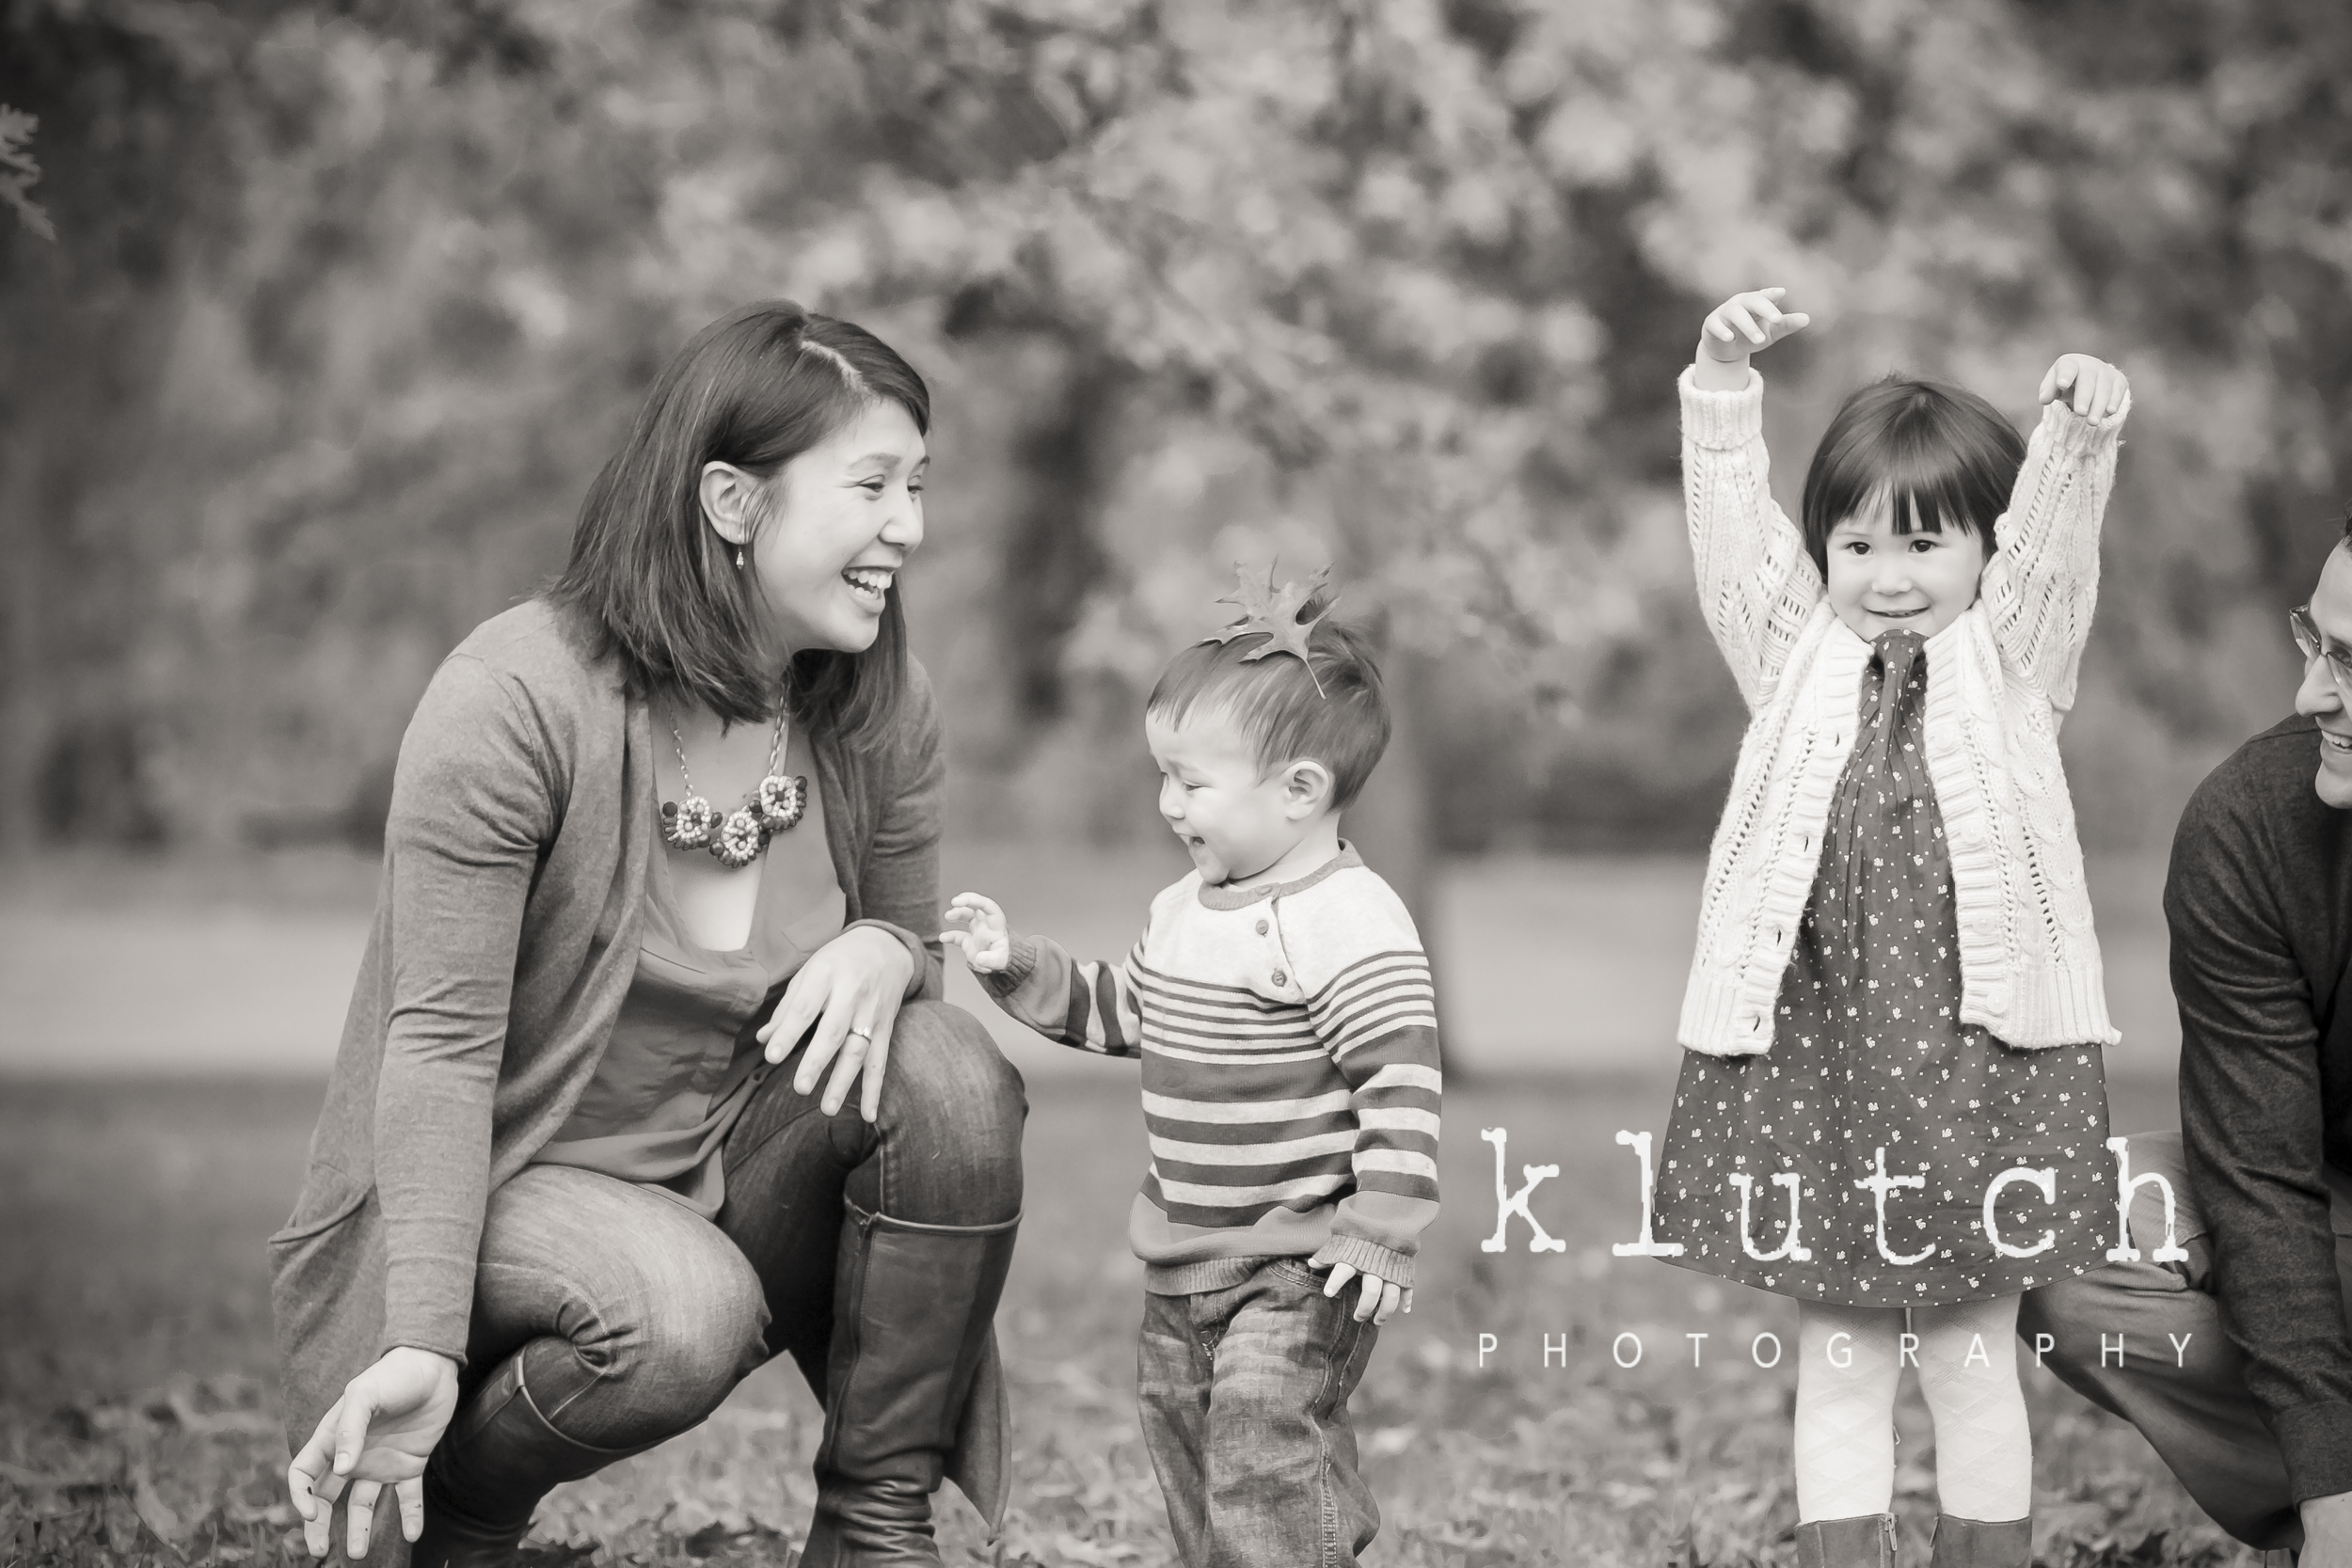 Klutch Photography,white rock family photographer, vancouver family photographer, whiterock lifestyle photographer, life unscripted photographer, life unscripted session, photography,Dina Ferreira Stoddard-23.jpg